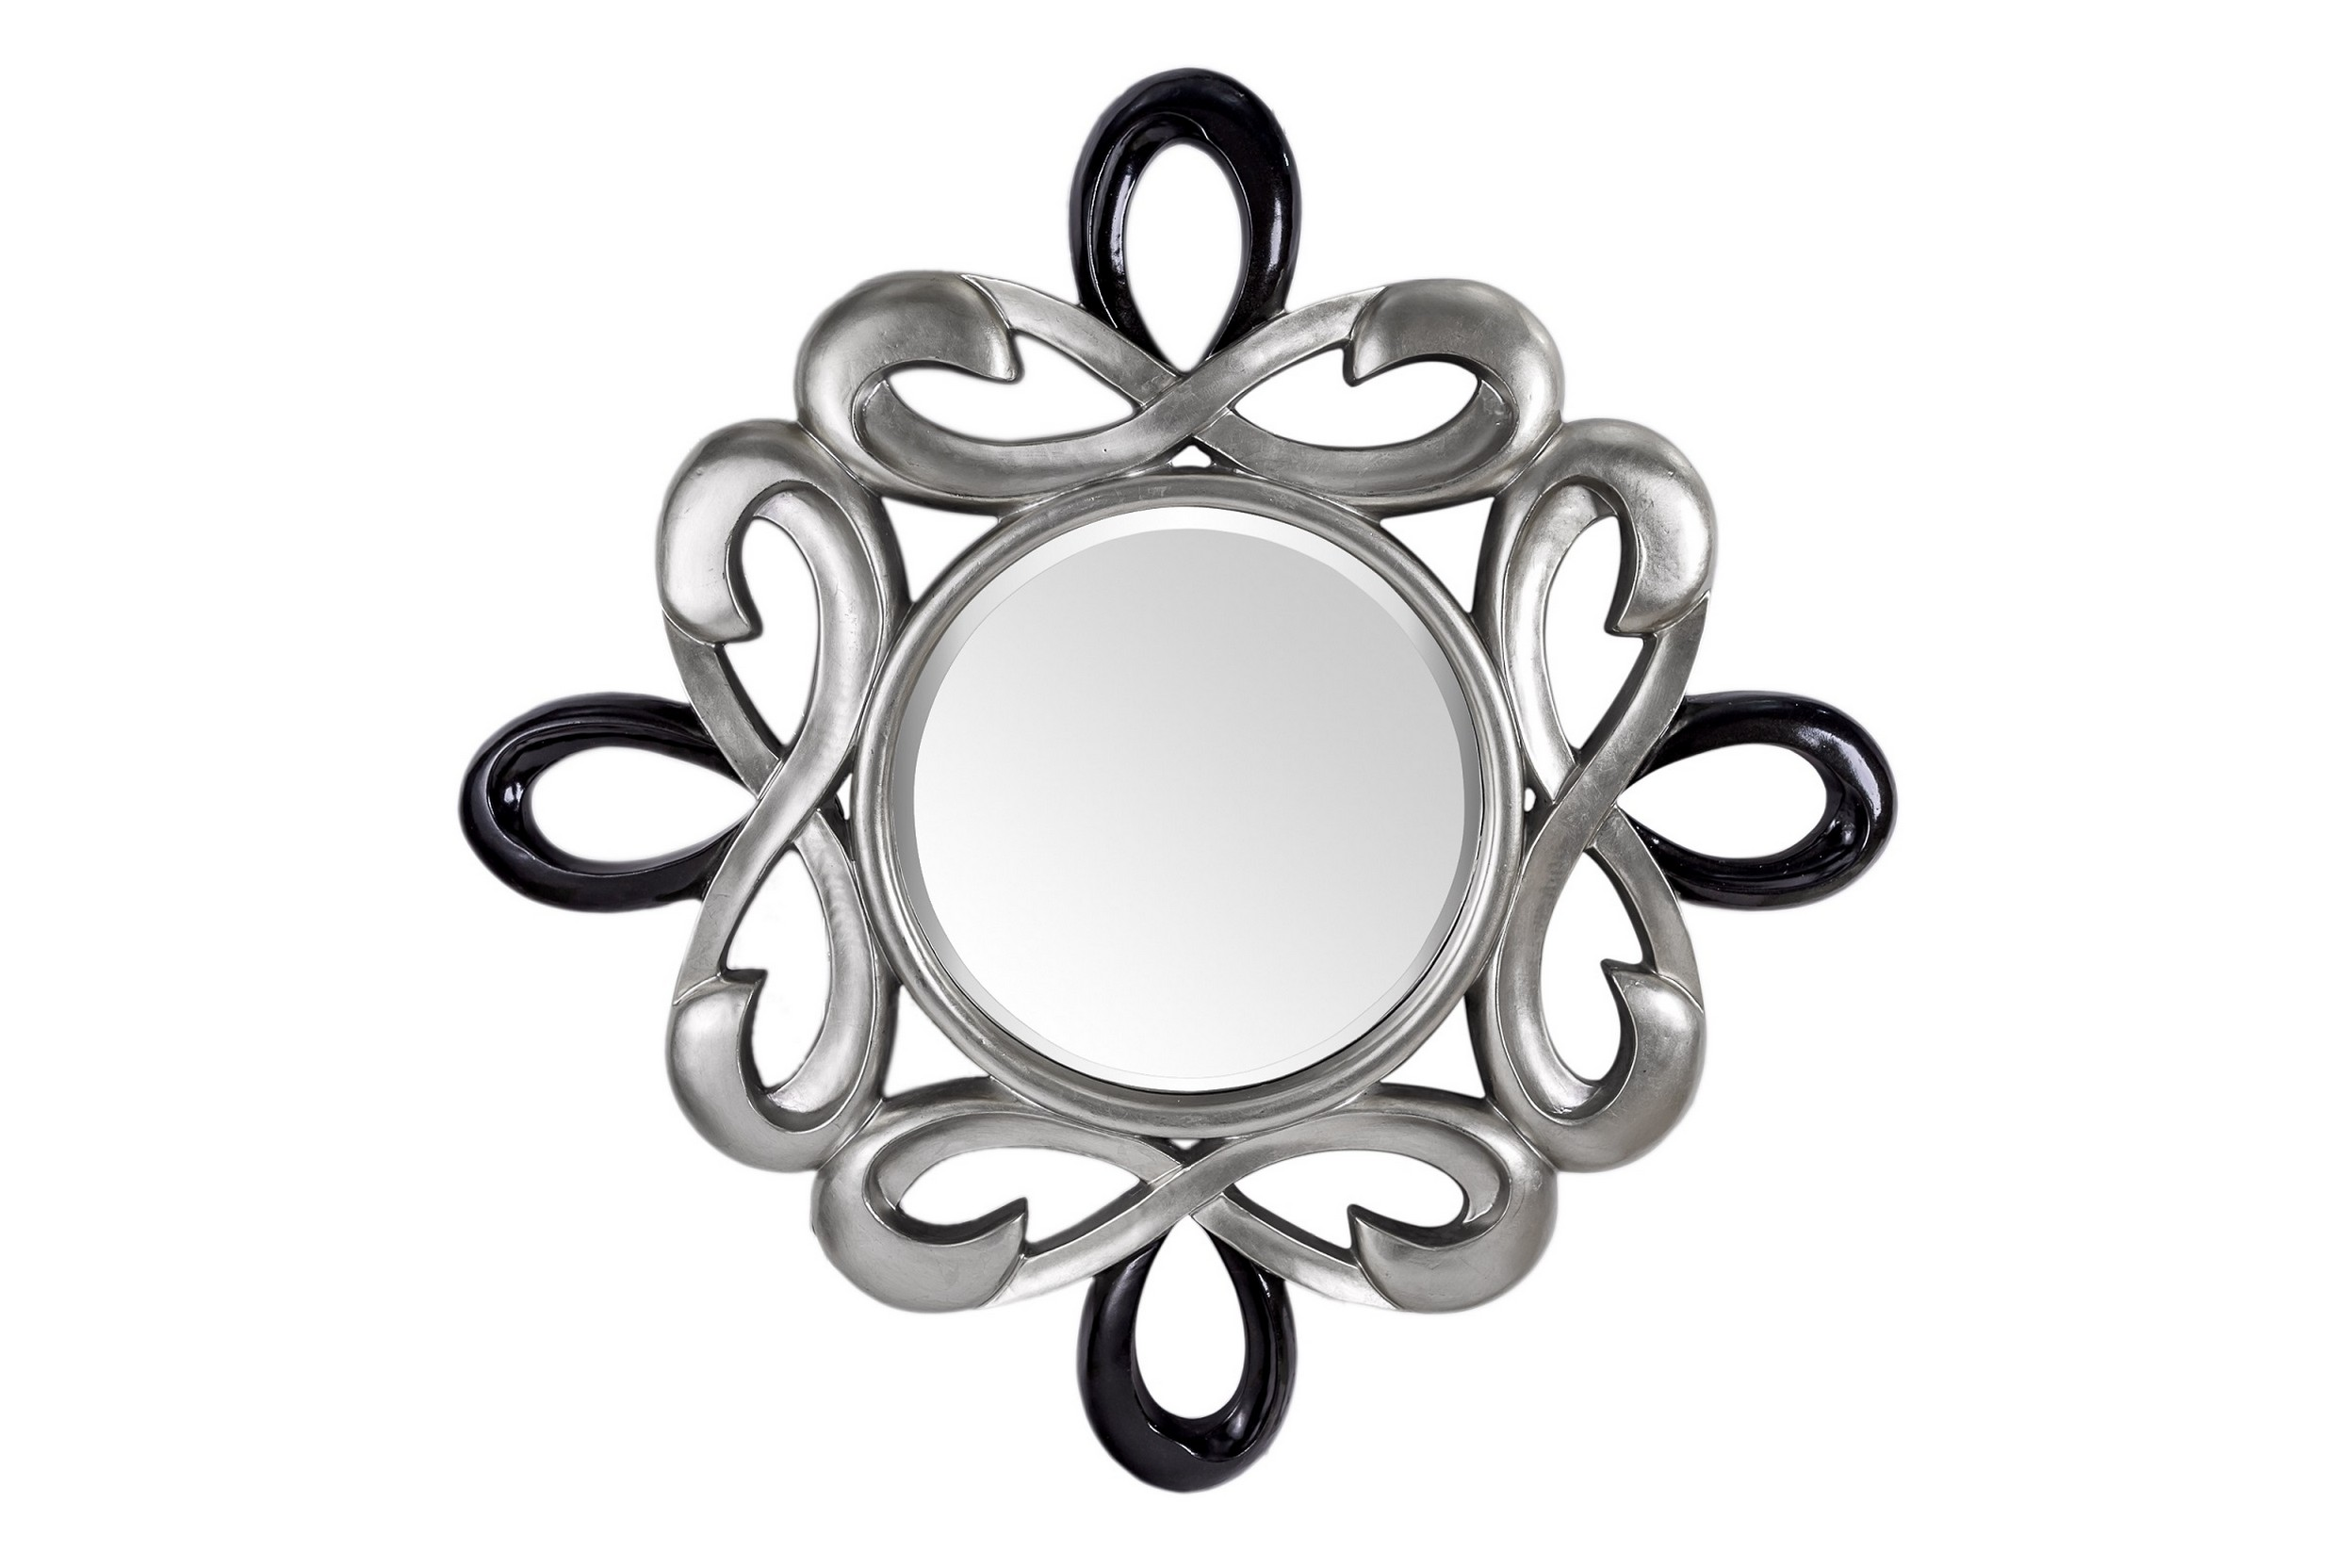 Зеркало ZodiacНастенные зеркала<br><br><br>Material: Стекло<br>Ширина см: 101.0<br>Высота см: 101.0<br>Глубина см: 5.0